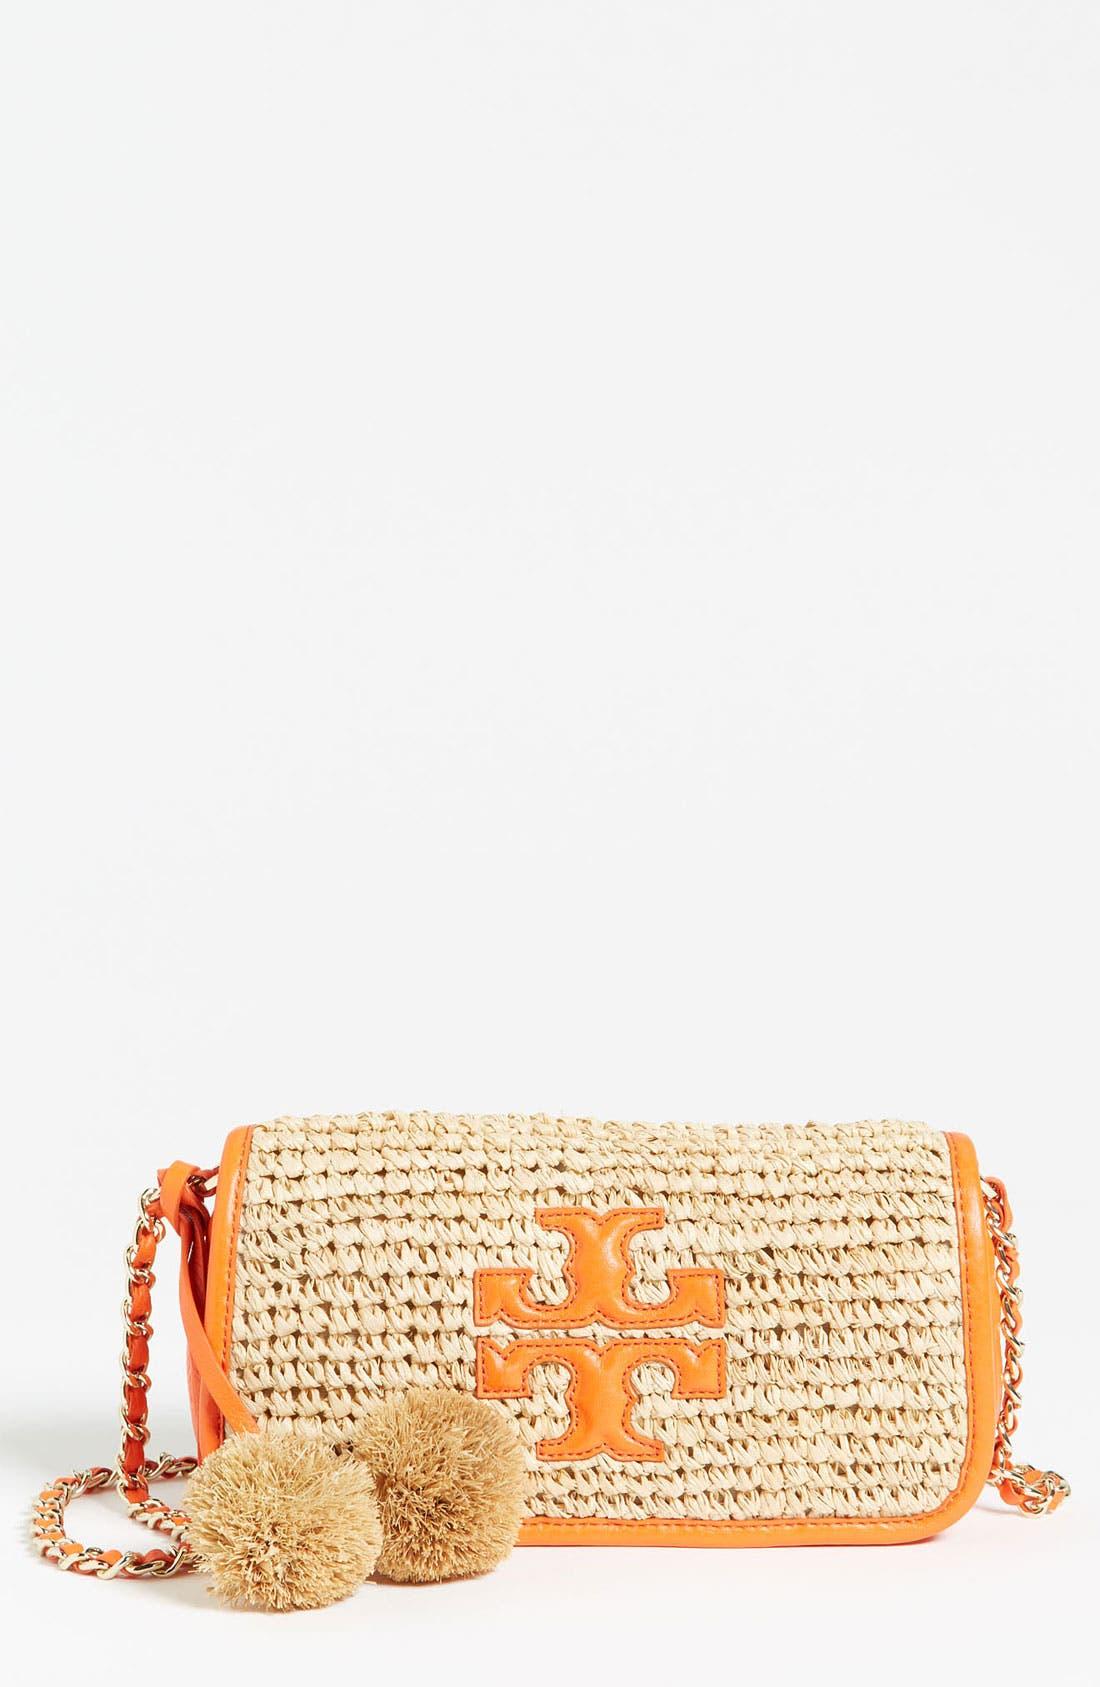 Main Image - Tory Burch 'Thea - Mini' Straw Crossbody Bag, Small